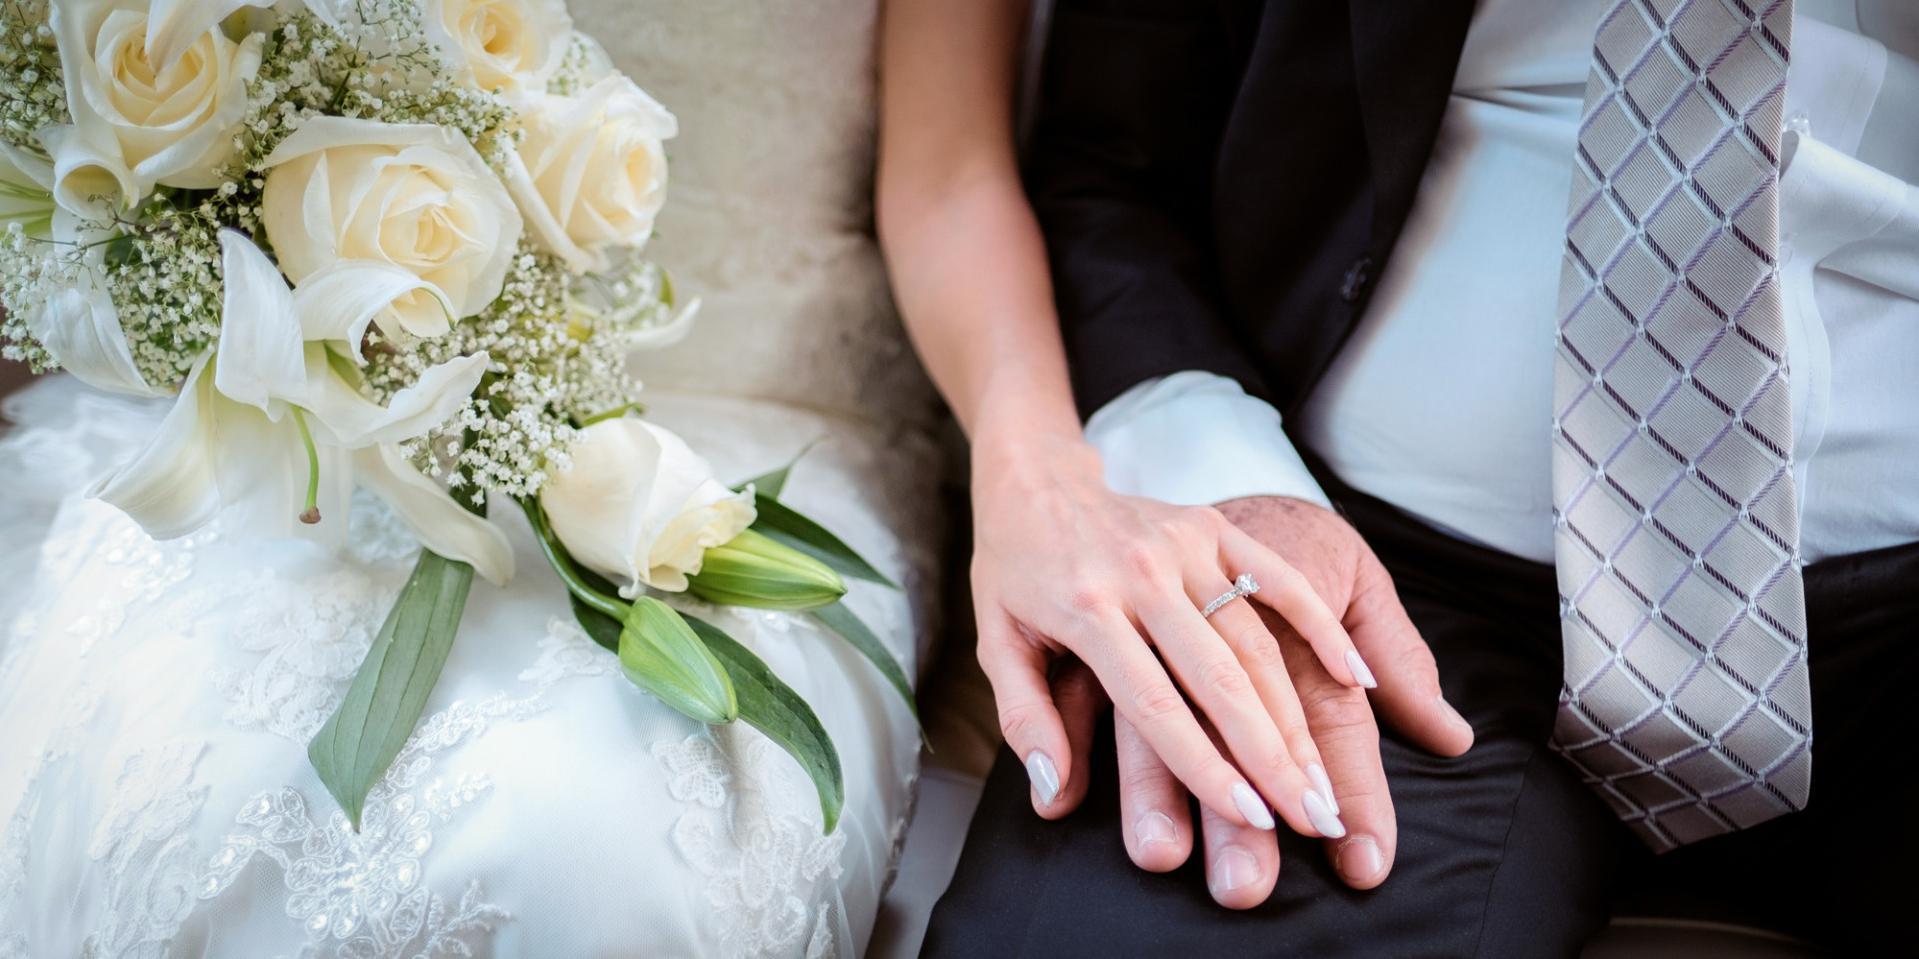 bodas-sin-clasificar-sin-tema-cuba-27561.jpg